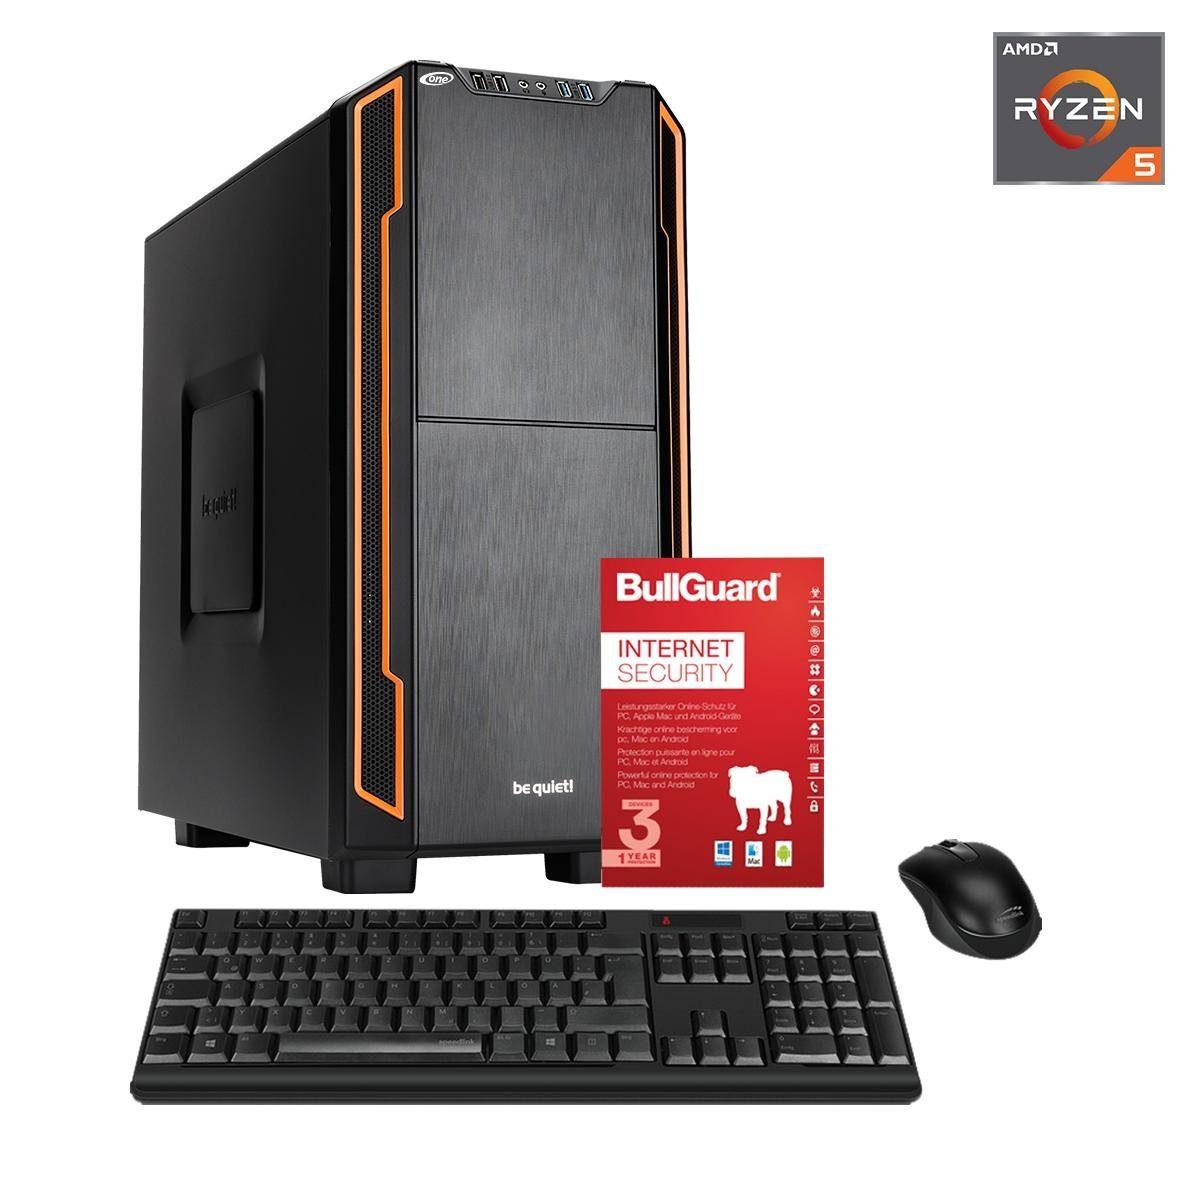 ONE PC, Ryzen 5 2600, GeForce GT 1030, 32GB DDR4 RAM »PC 44089«